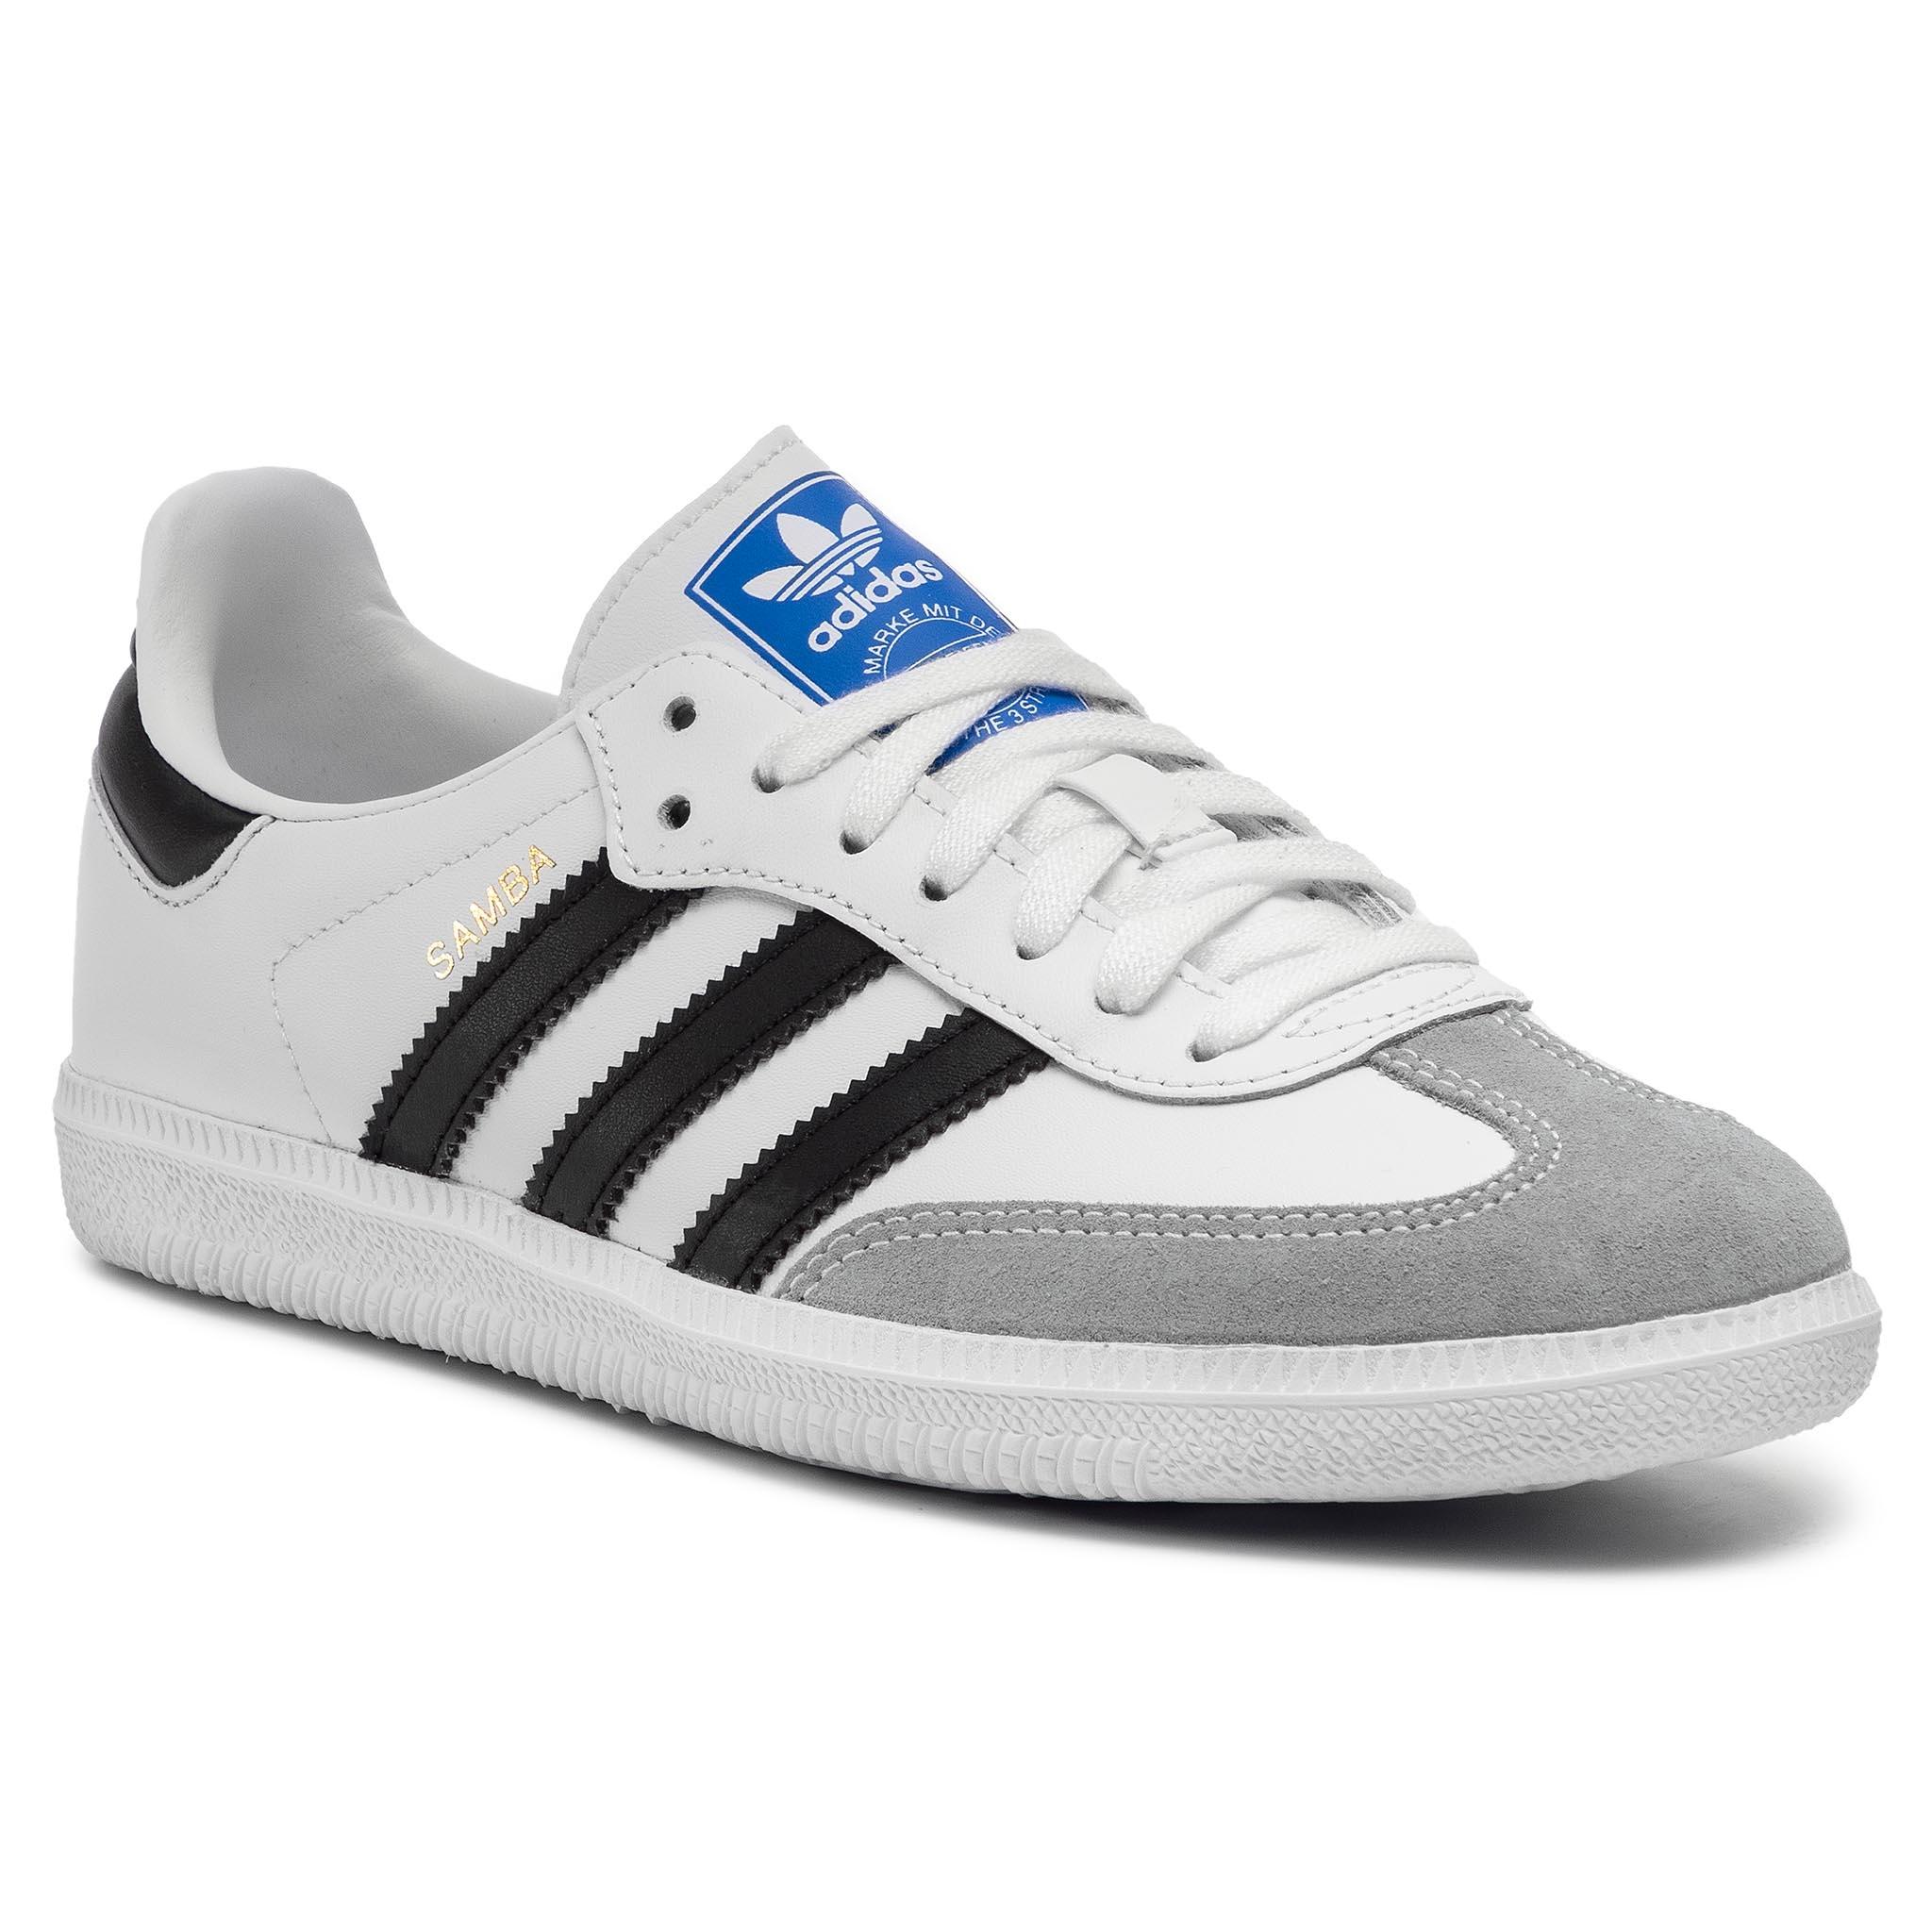 970c93f75bf Shoes adidas - Samba Og B75807 Cblack Ftwwht Gum5 - Sneakers - Low ...